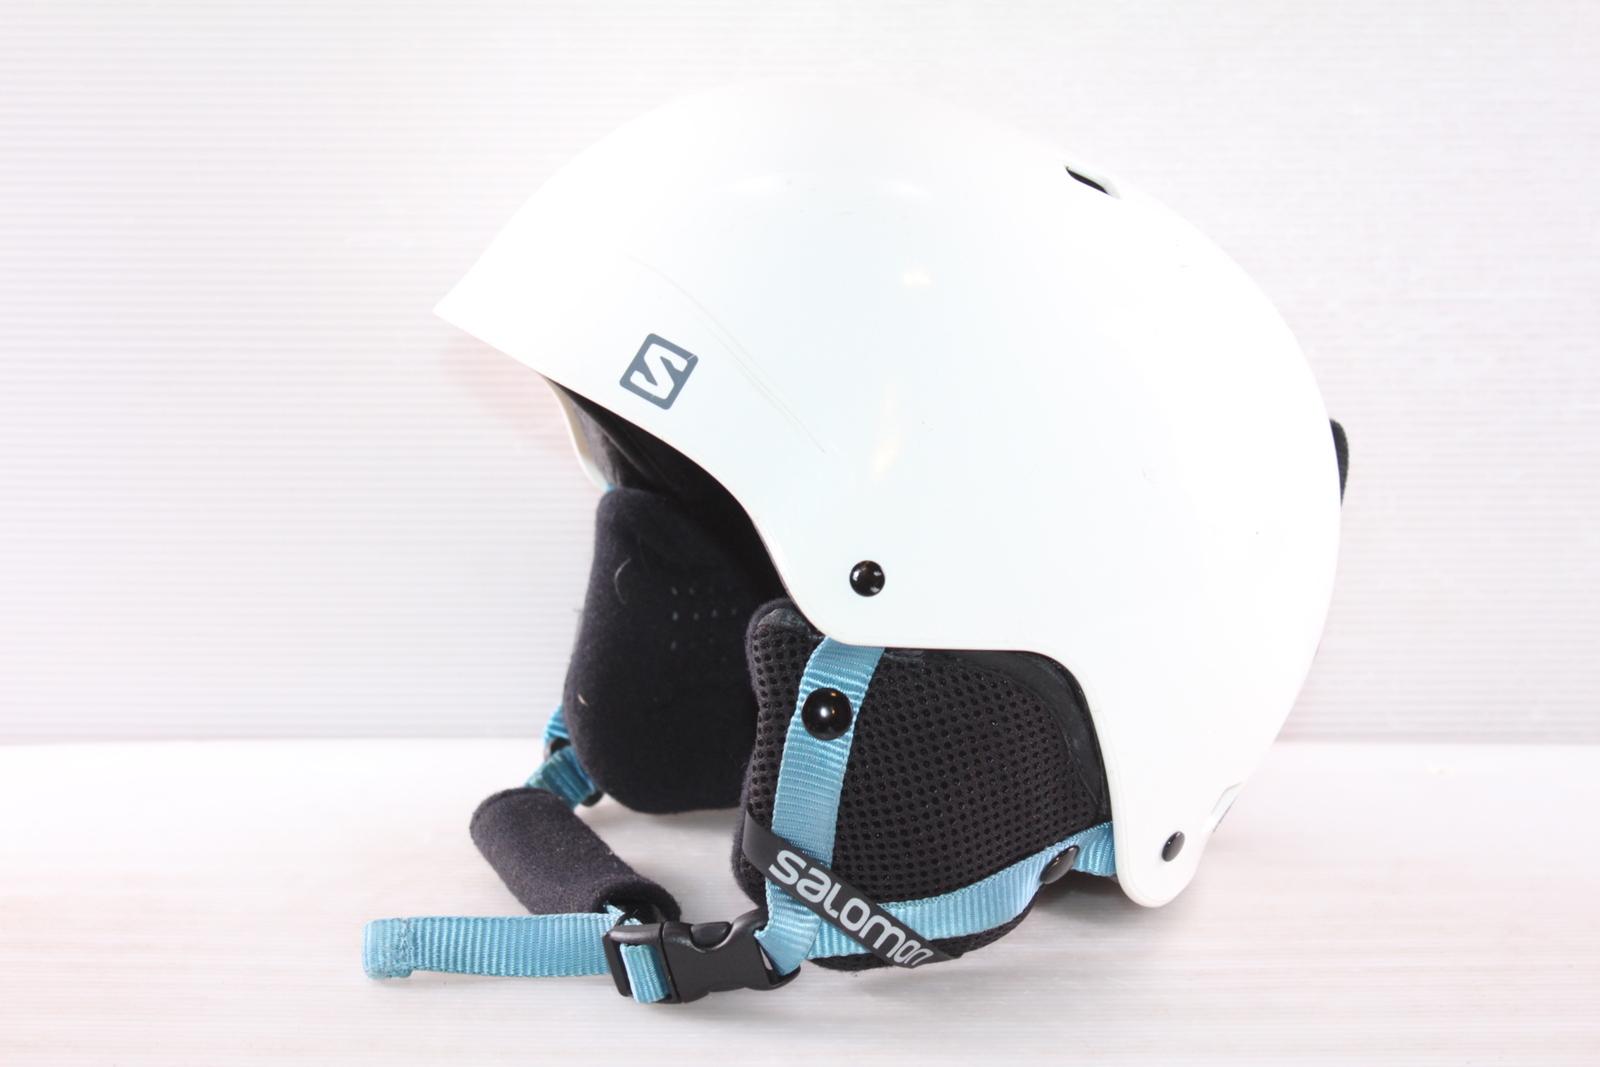 Dětská lyžařská helma Salomon Kiana Rental Blue - posuvná vel. 51 - 55